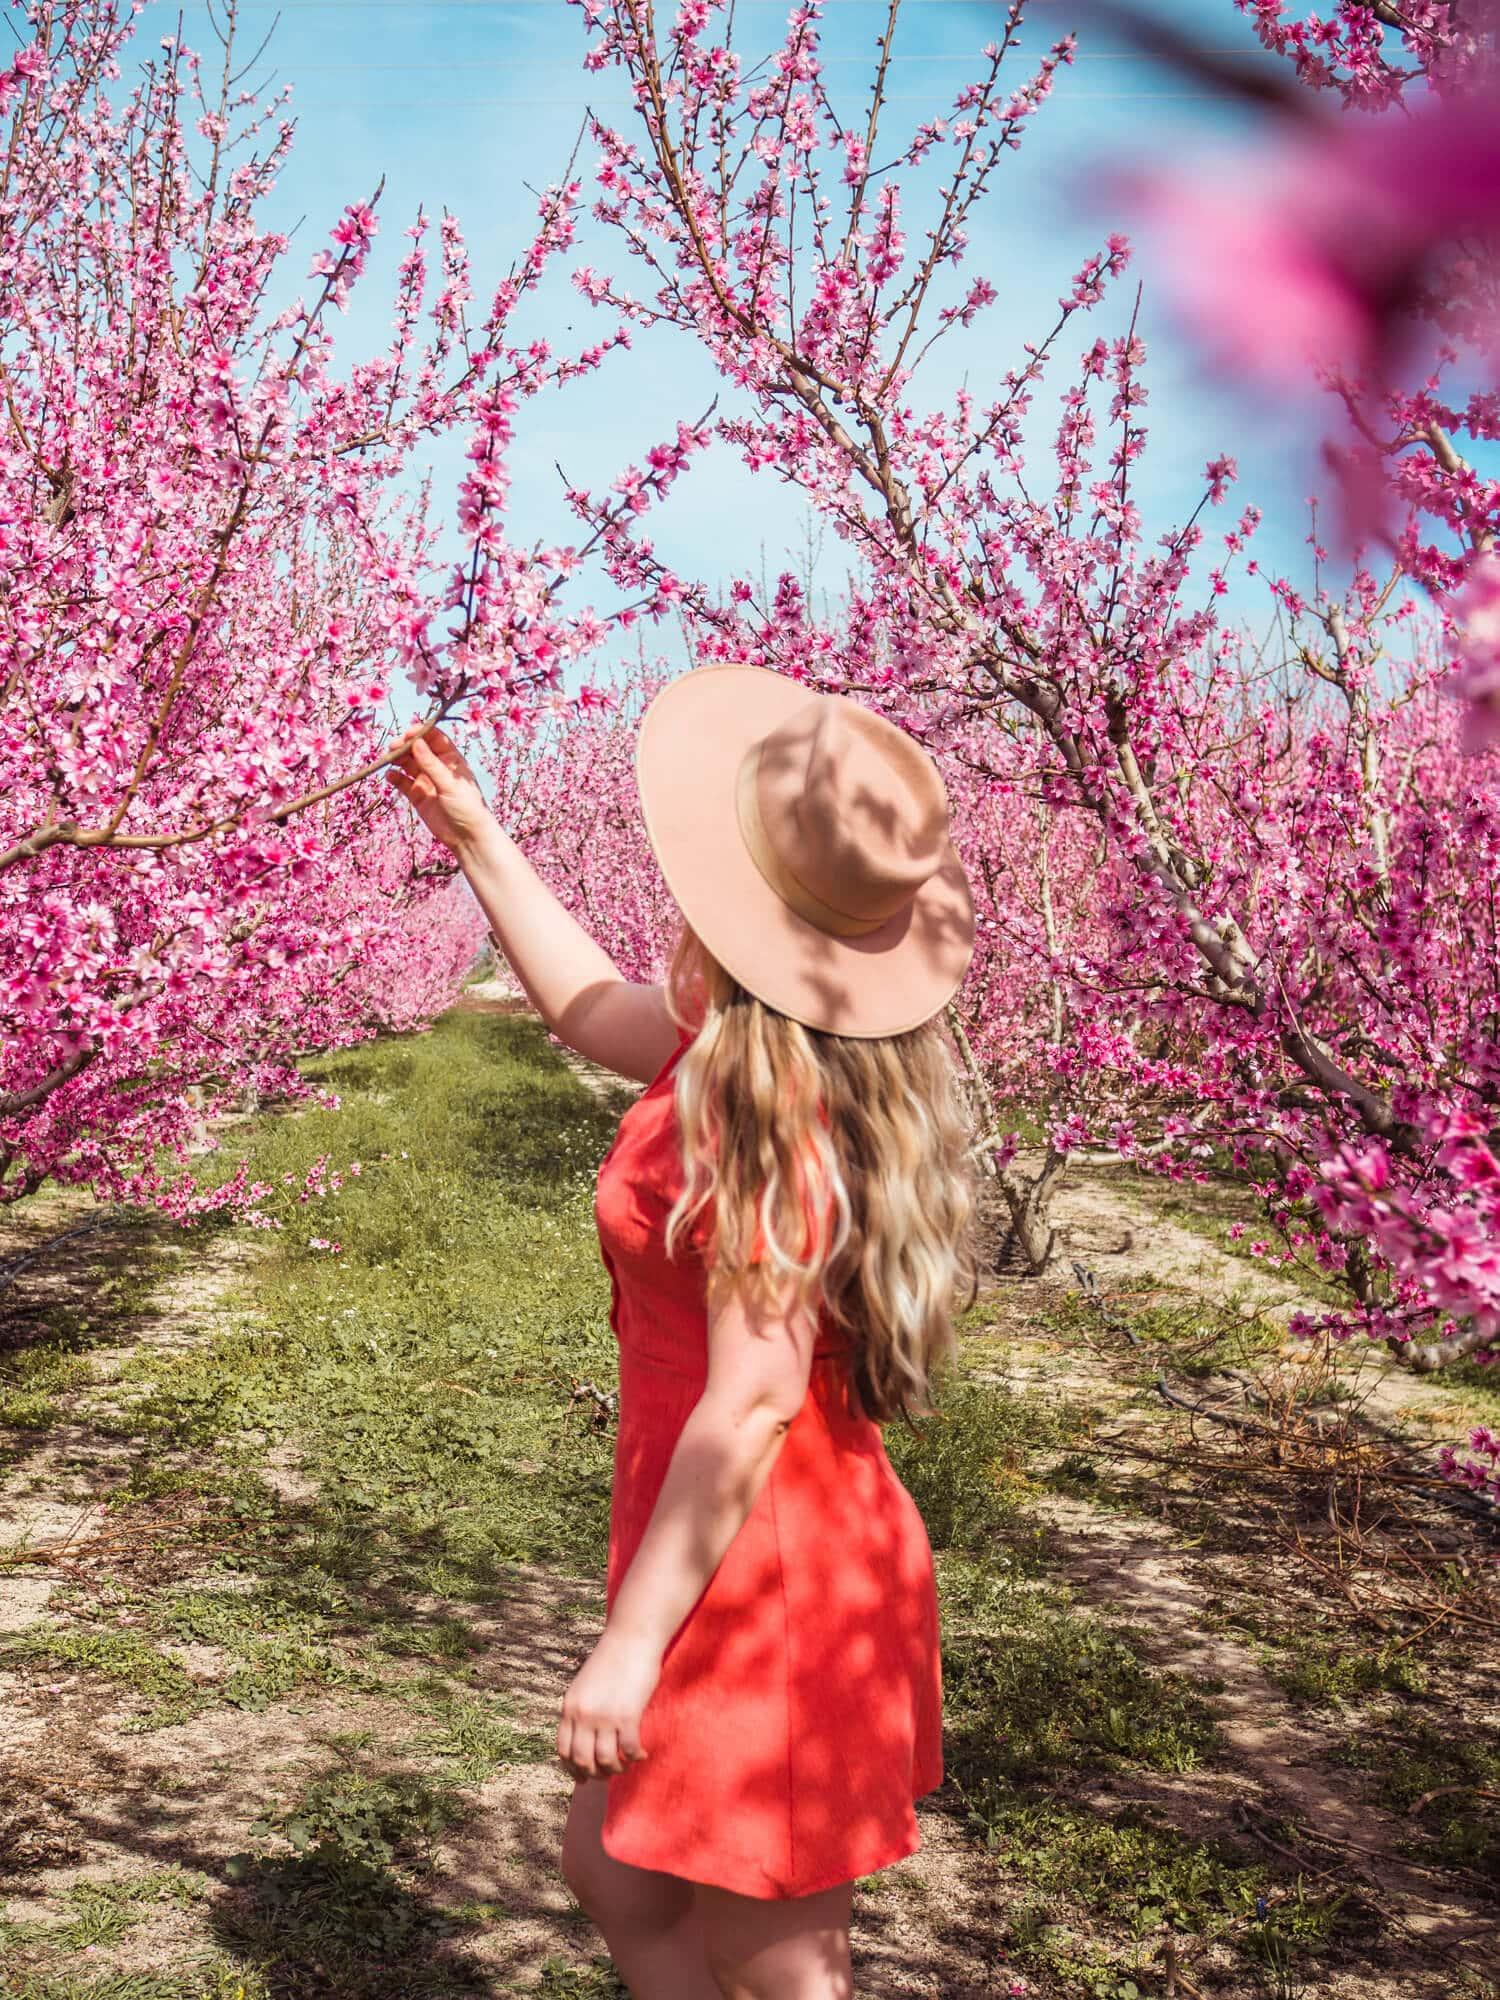 Smelling the sweet peach tree blossoms at Floración de Cieza in Murcia, Spain